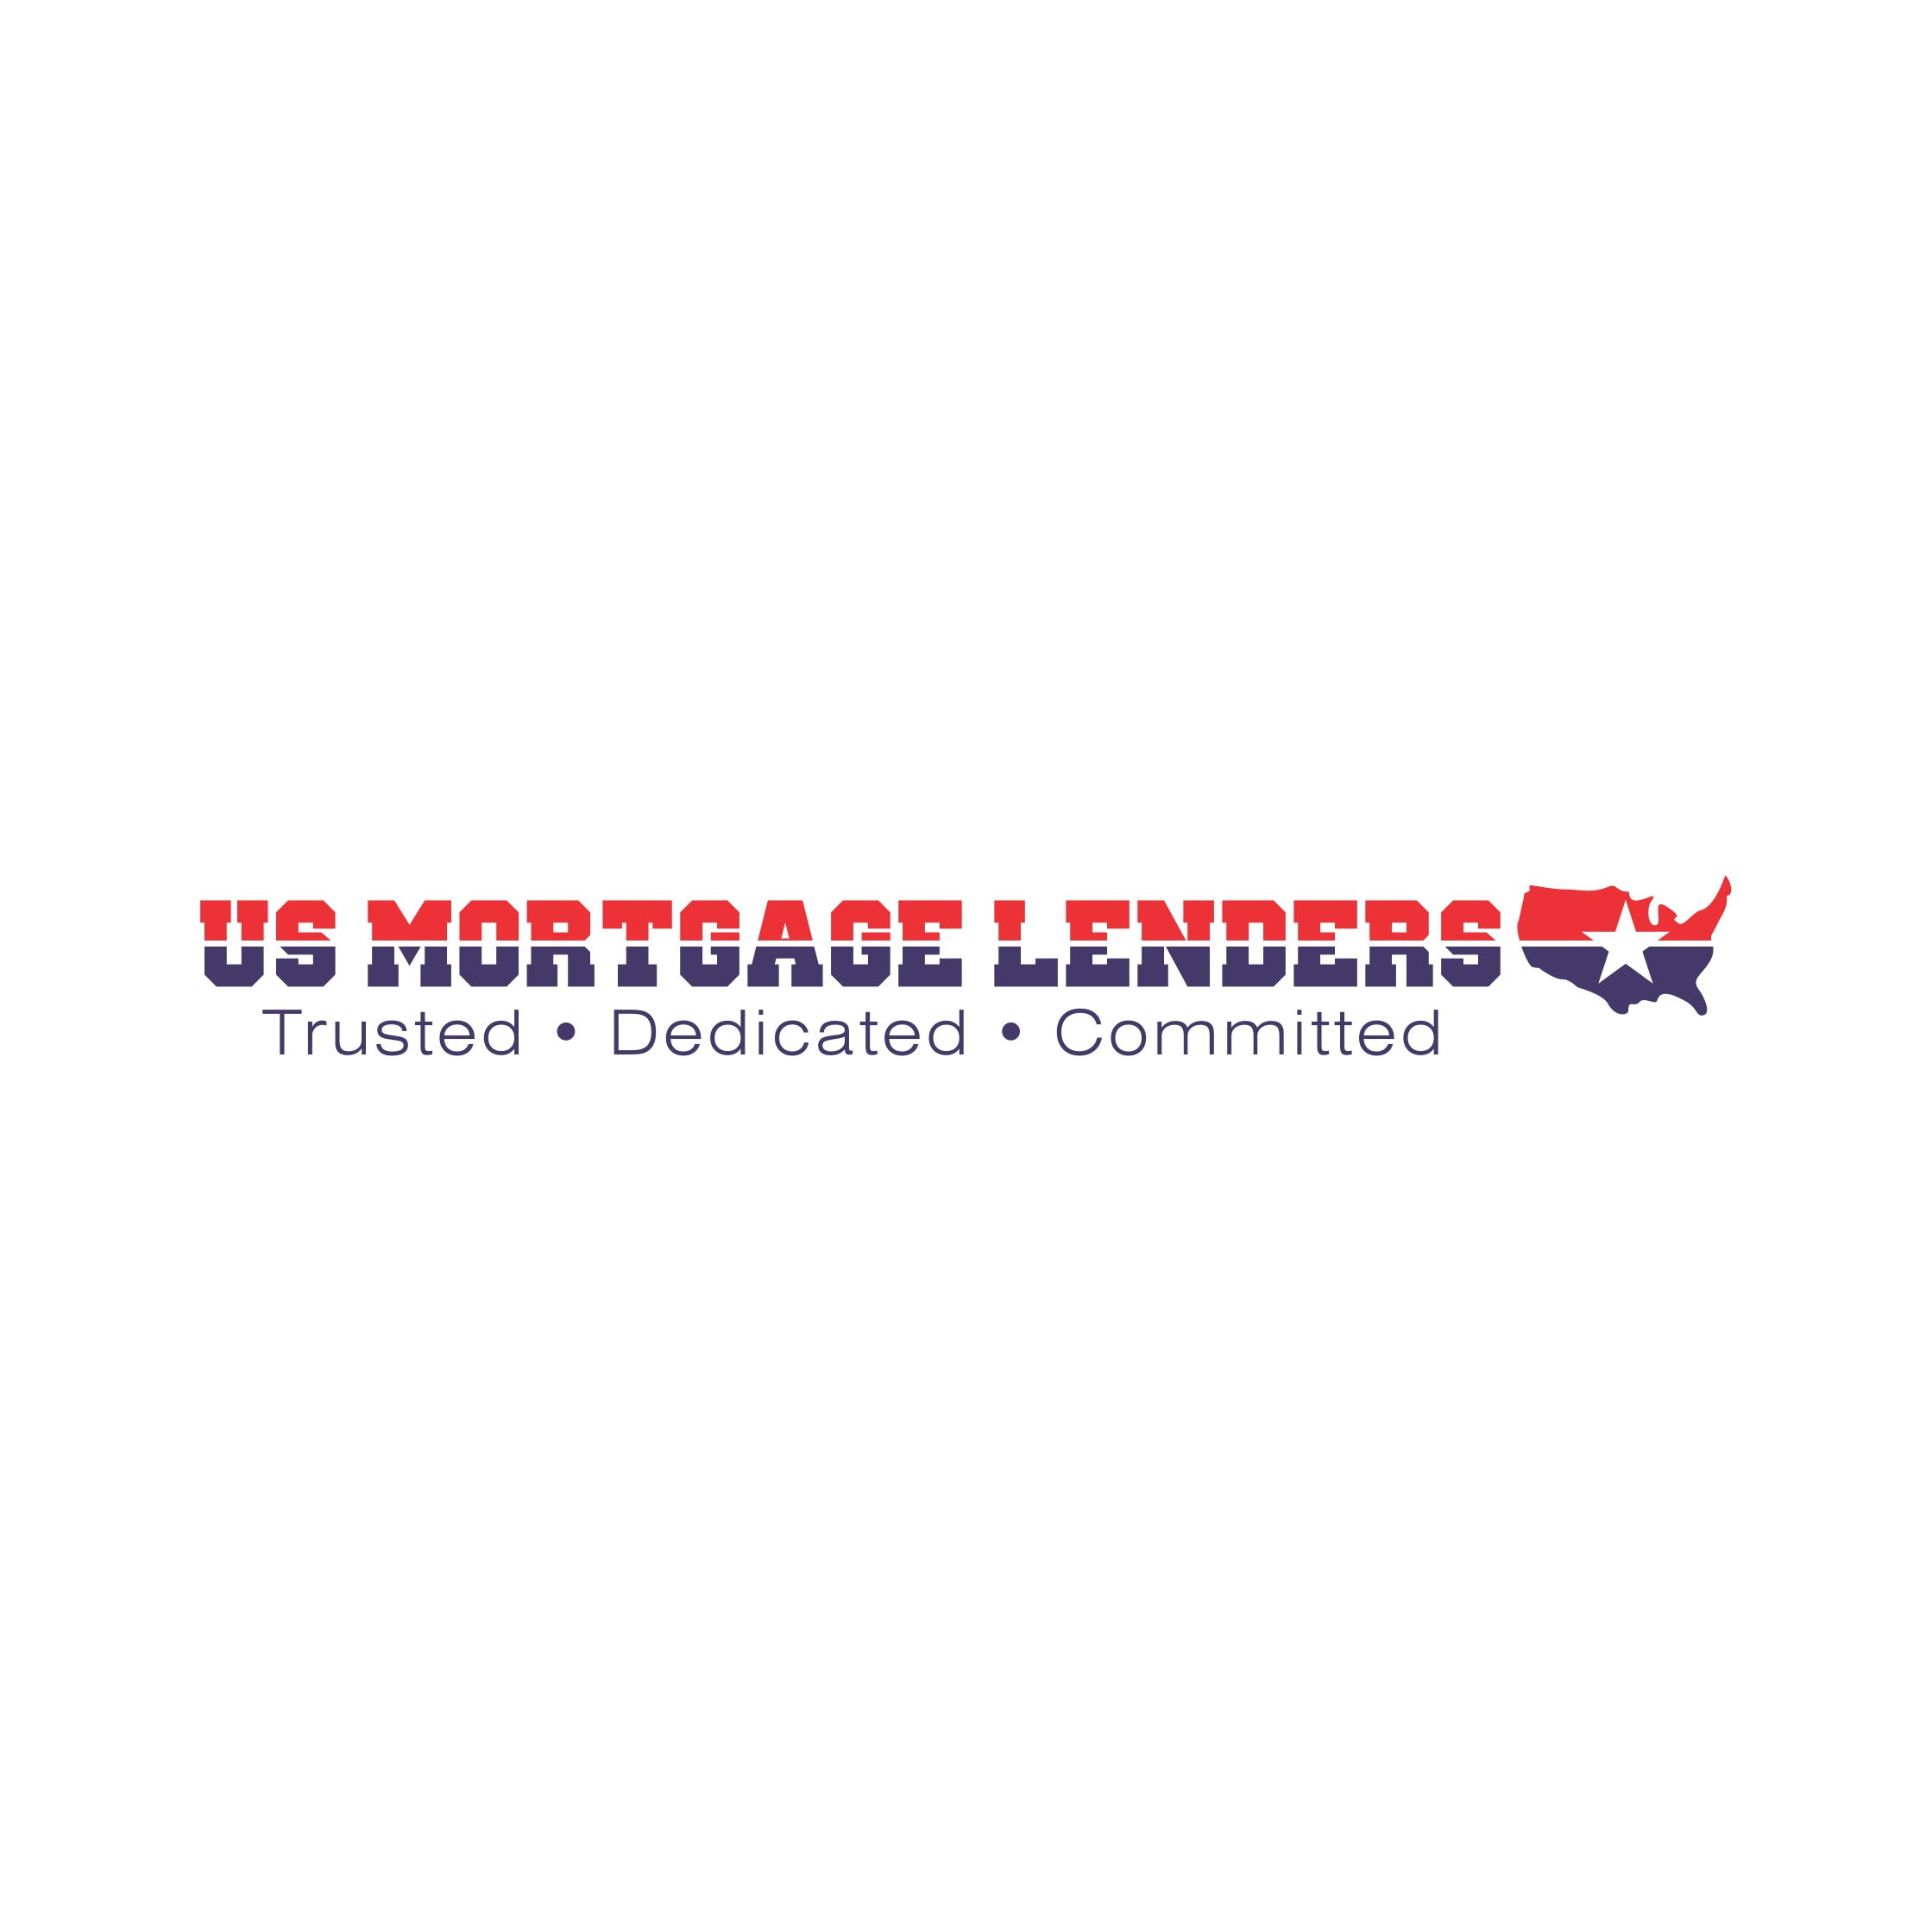 US Mortgage Lenders